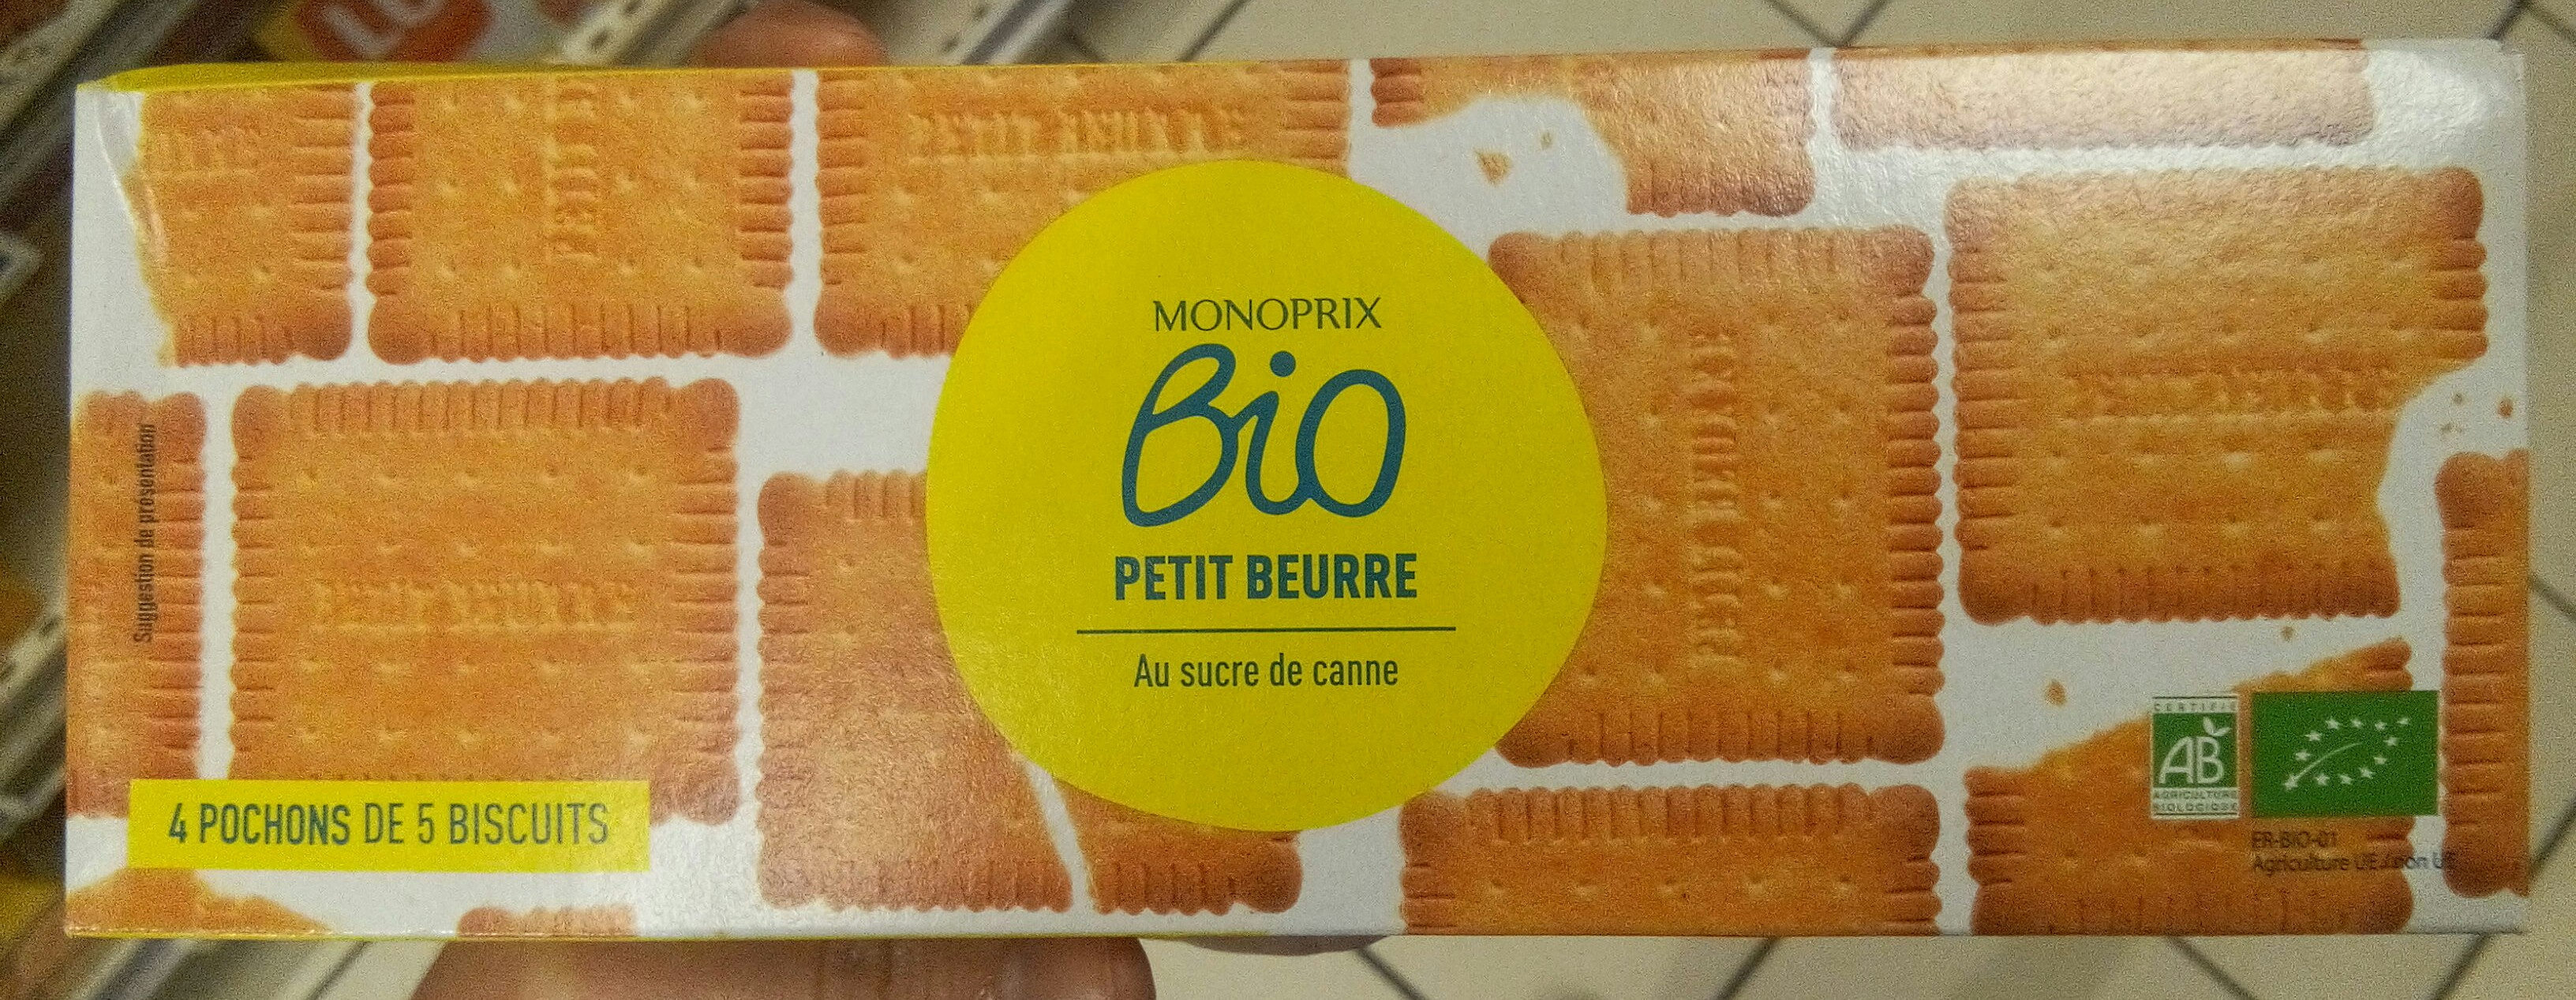 Petit beurre Monoprix bio - Product